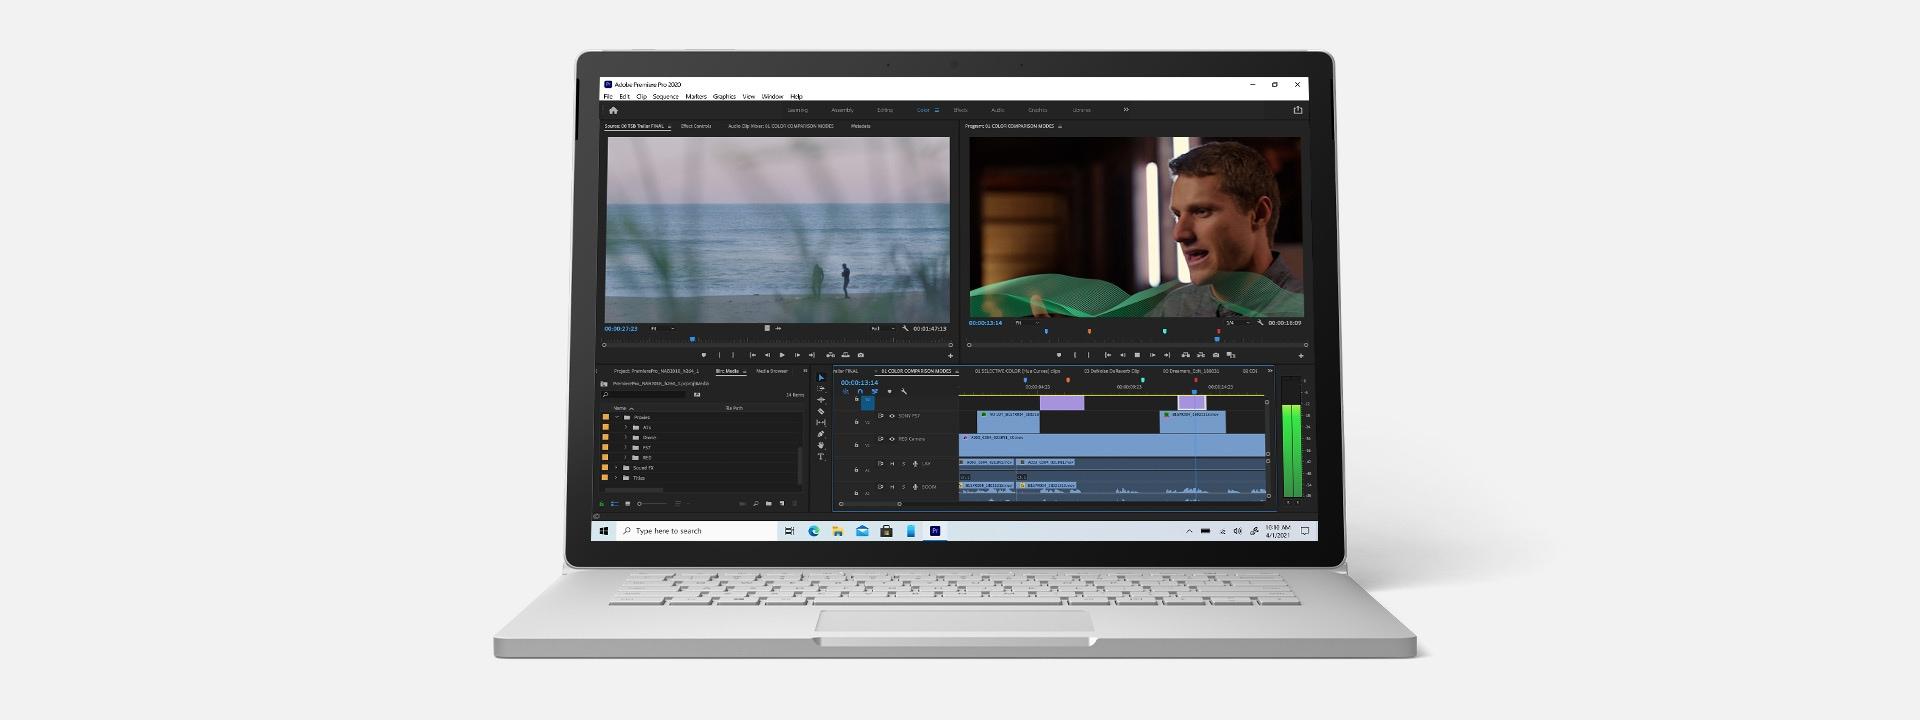 Surface Book 3 running Adobe Premiere